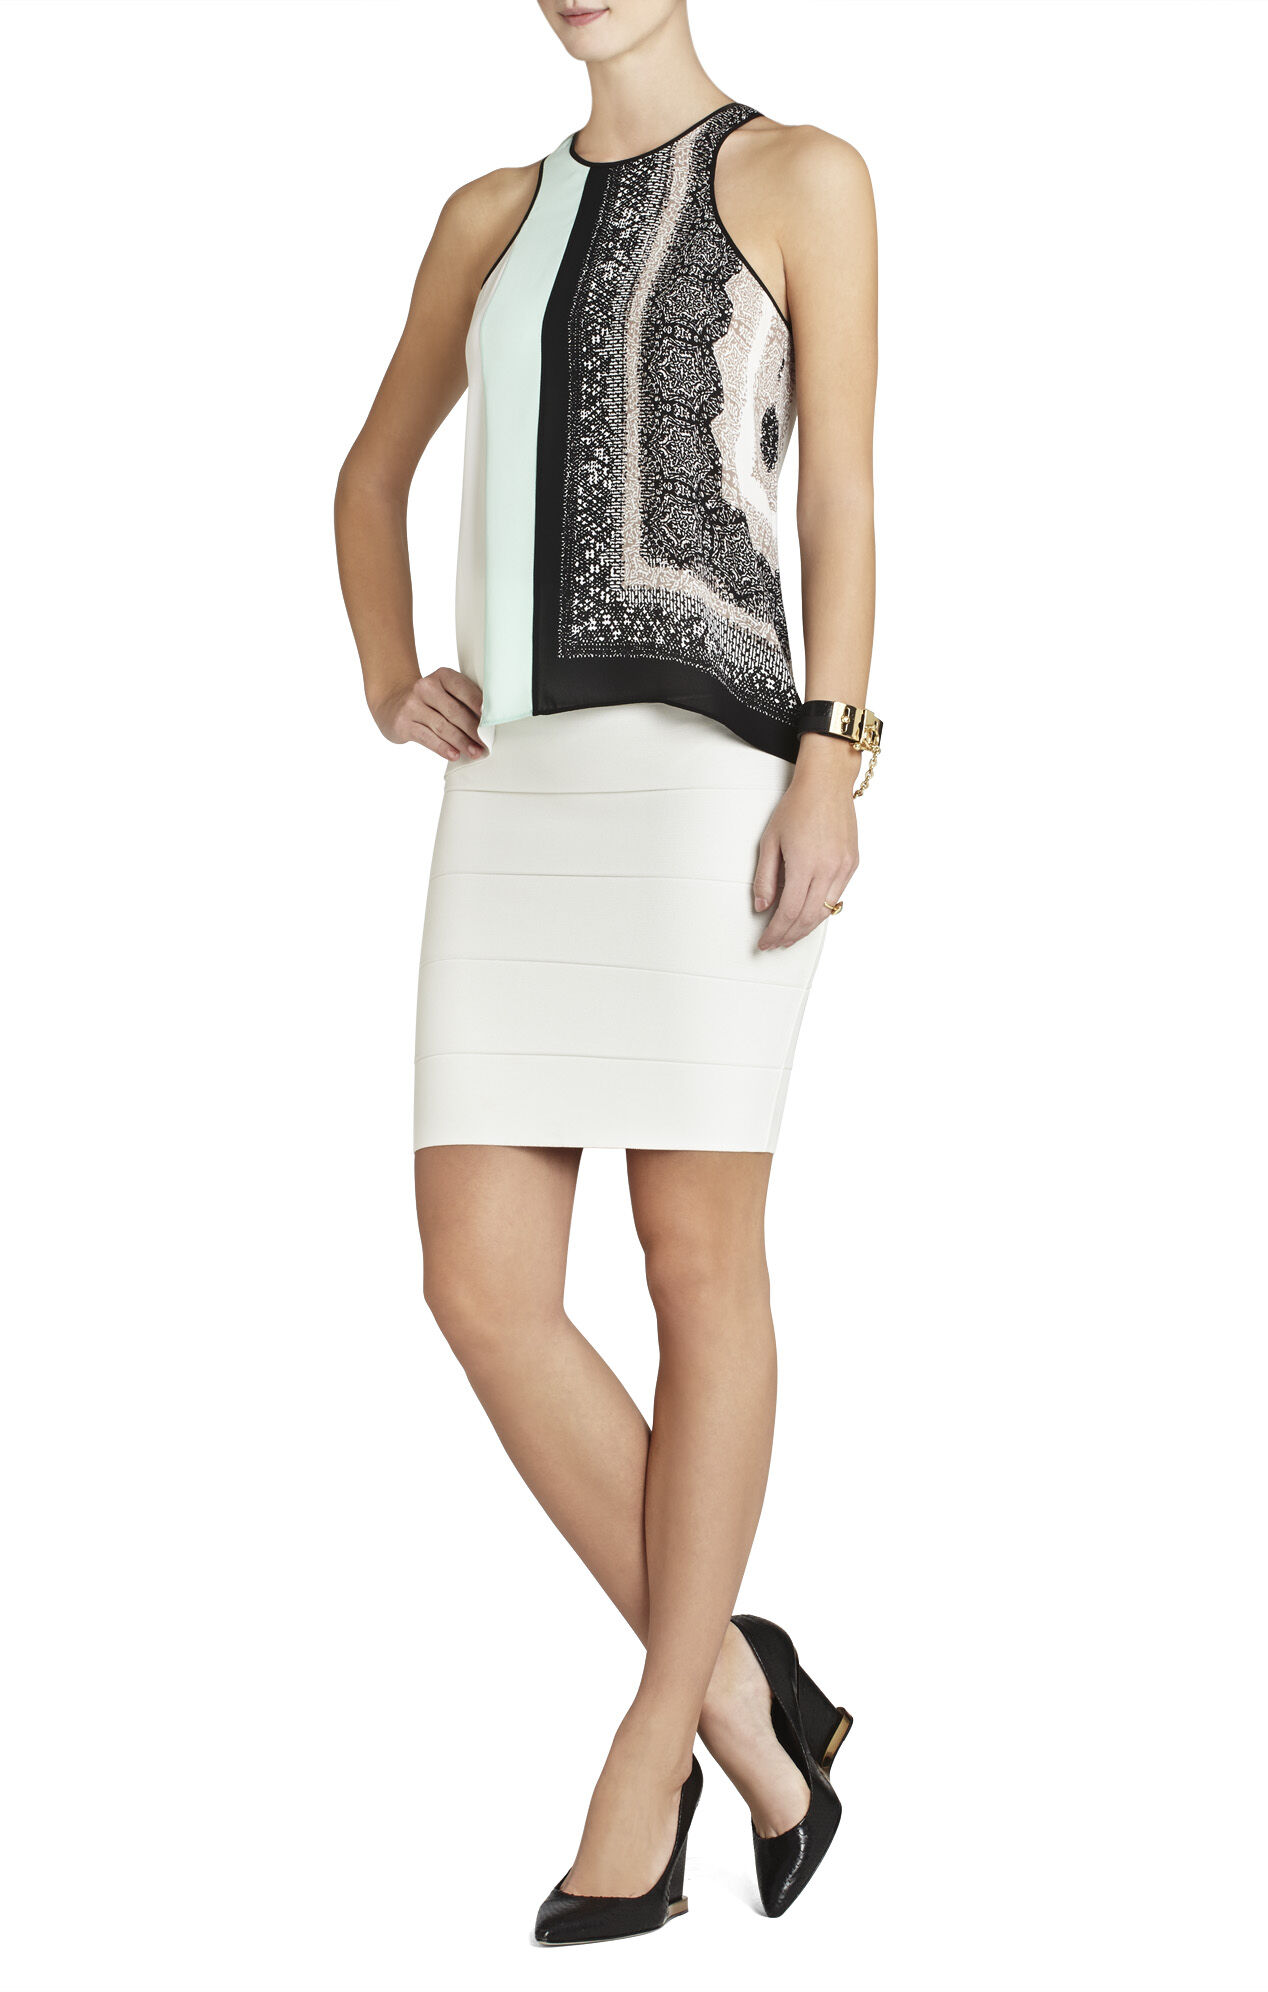 Eleeza Print-Blocked Sleeveless Top